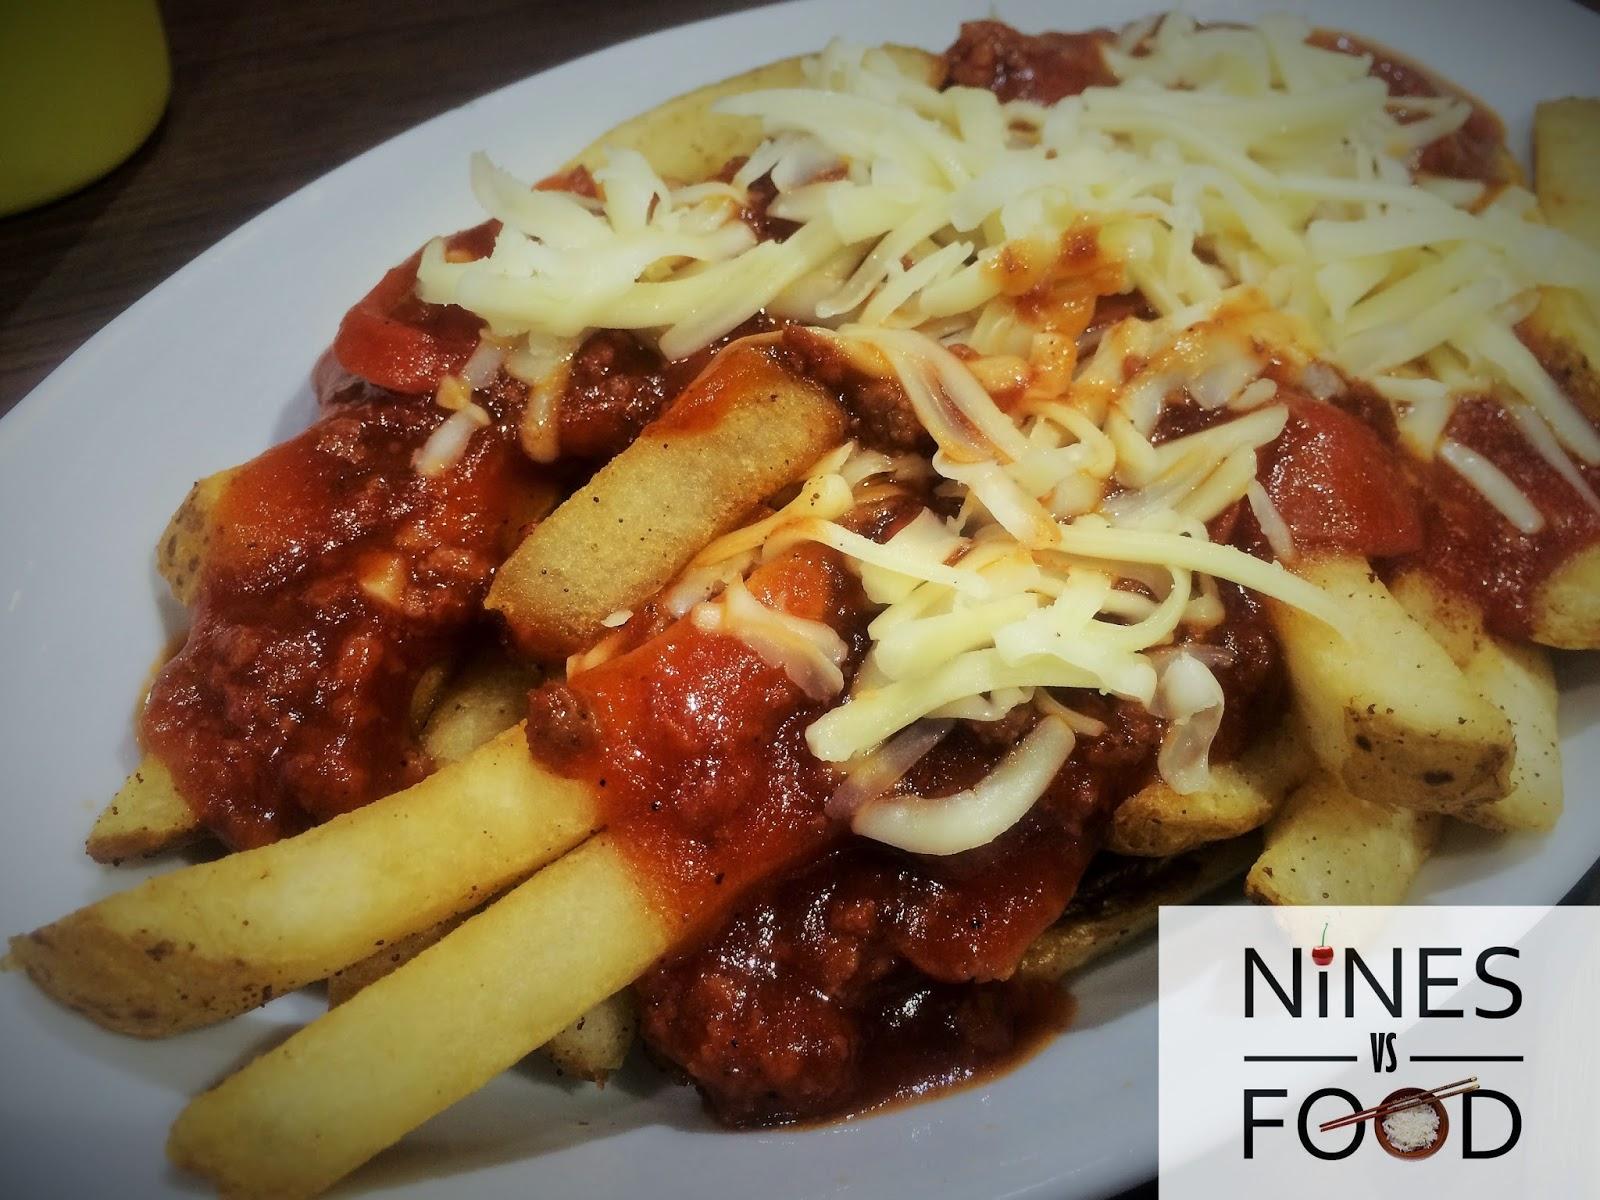 Nines vs Food - Wham! Burgers and Sausages-11.jpg